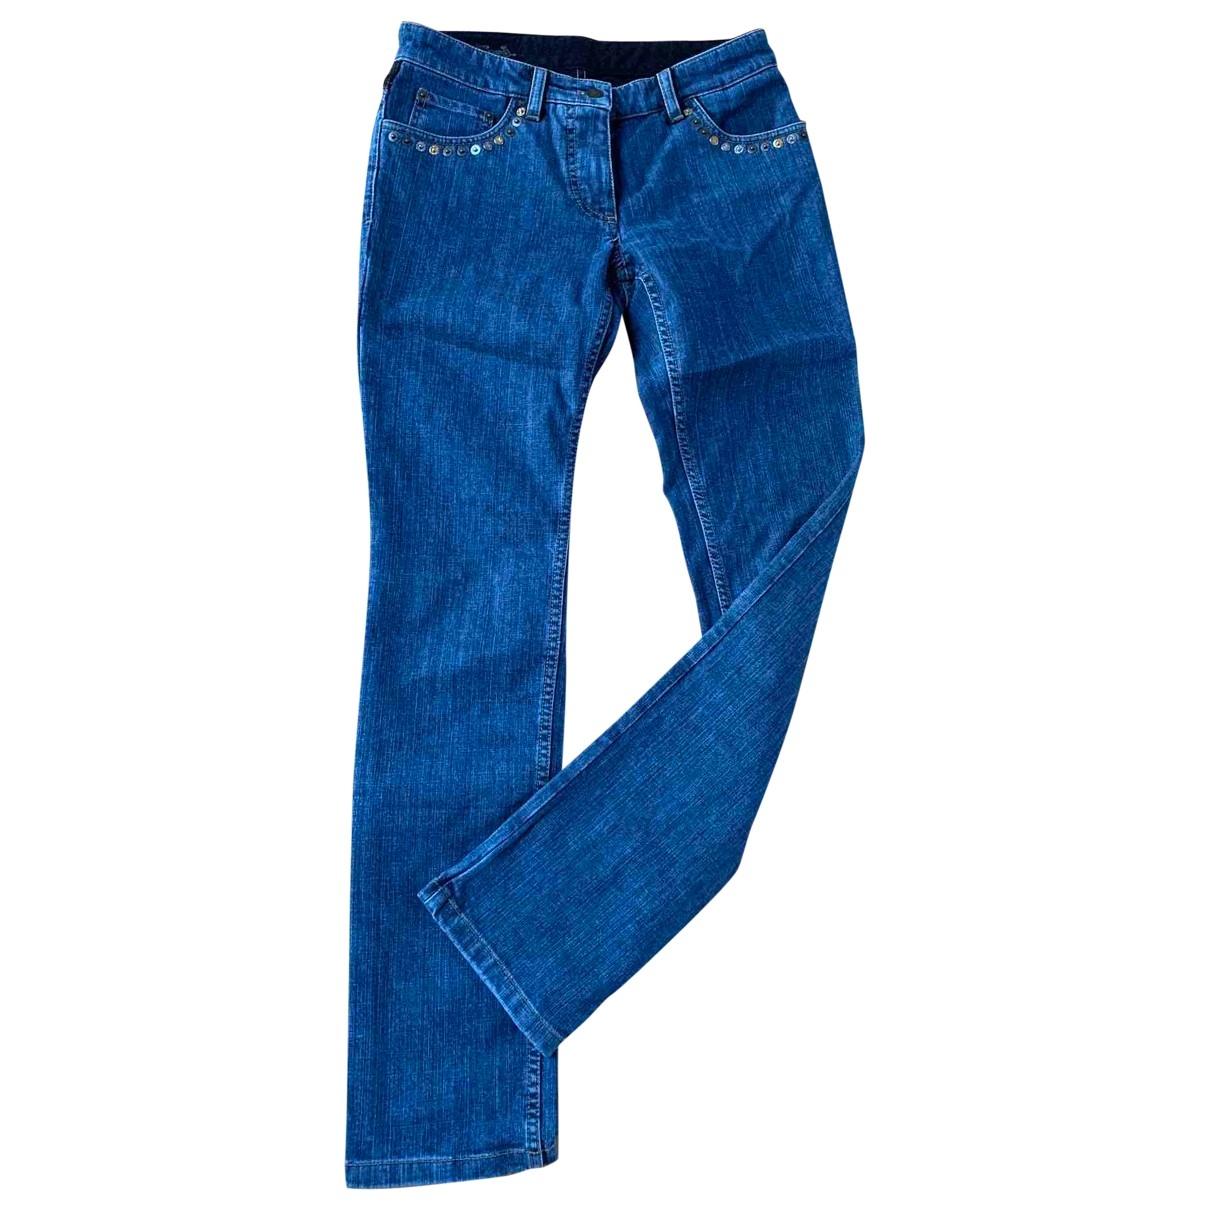 Louis Vuitton - Pantalon   pour femme en coton - bleu